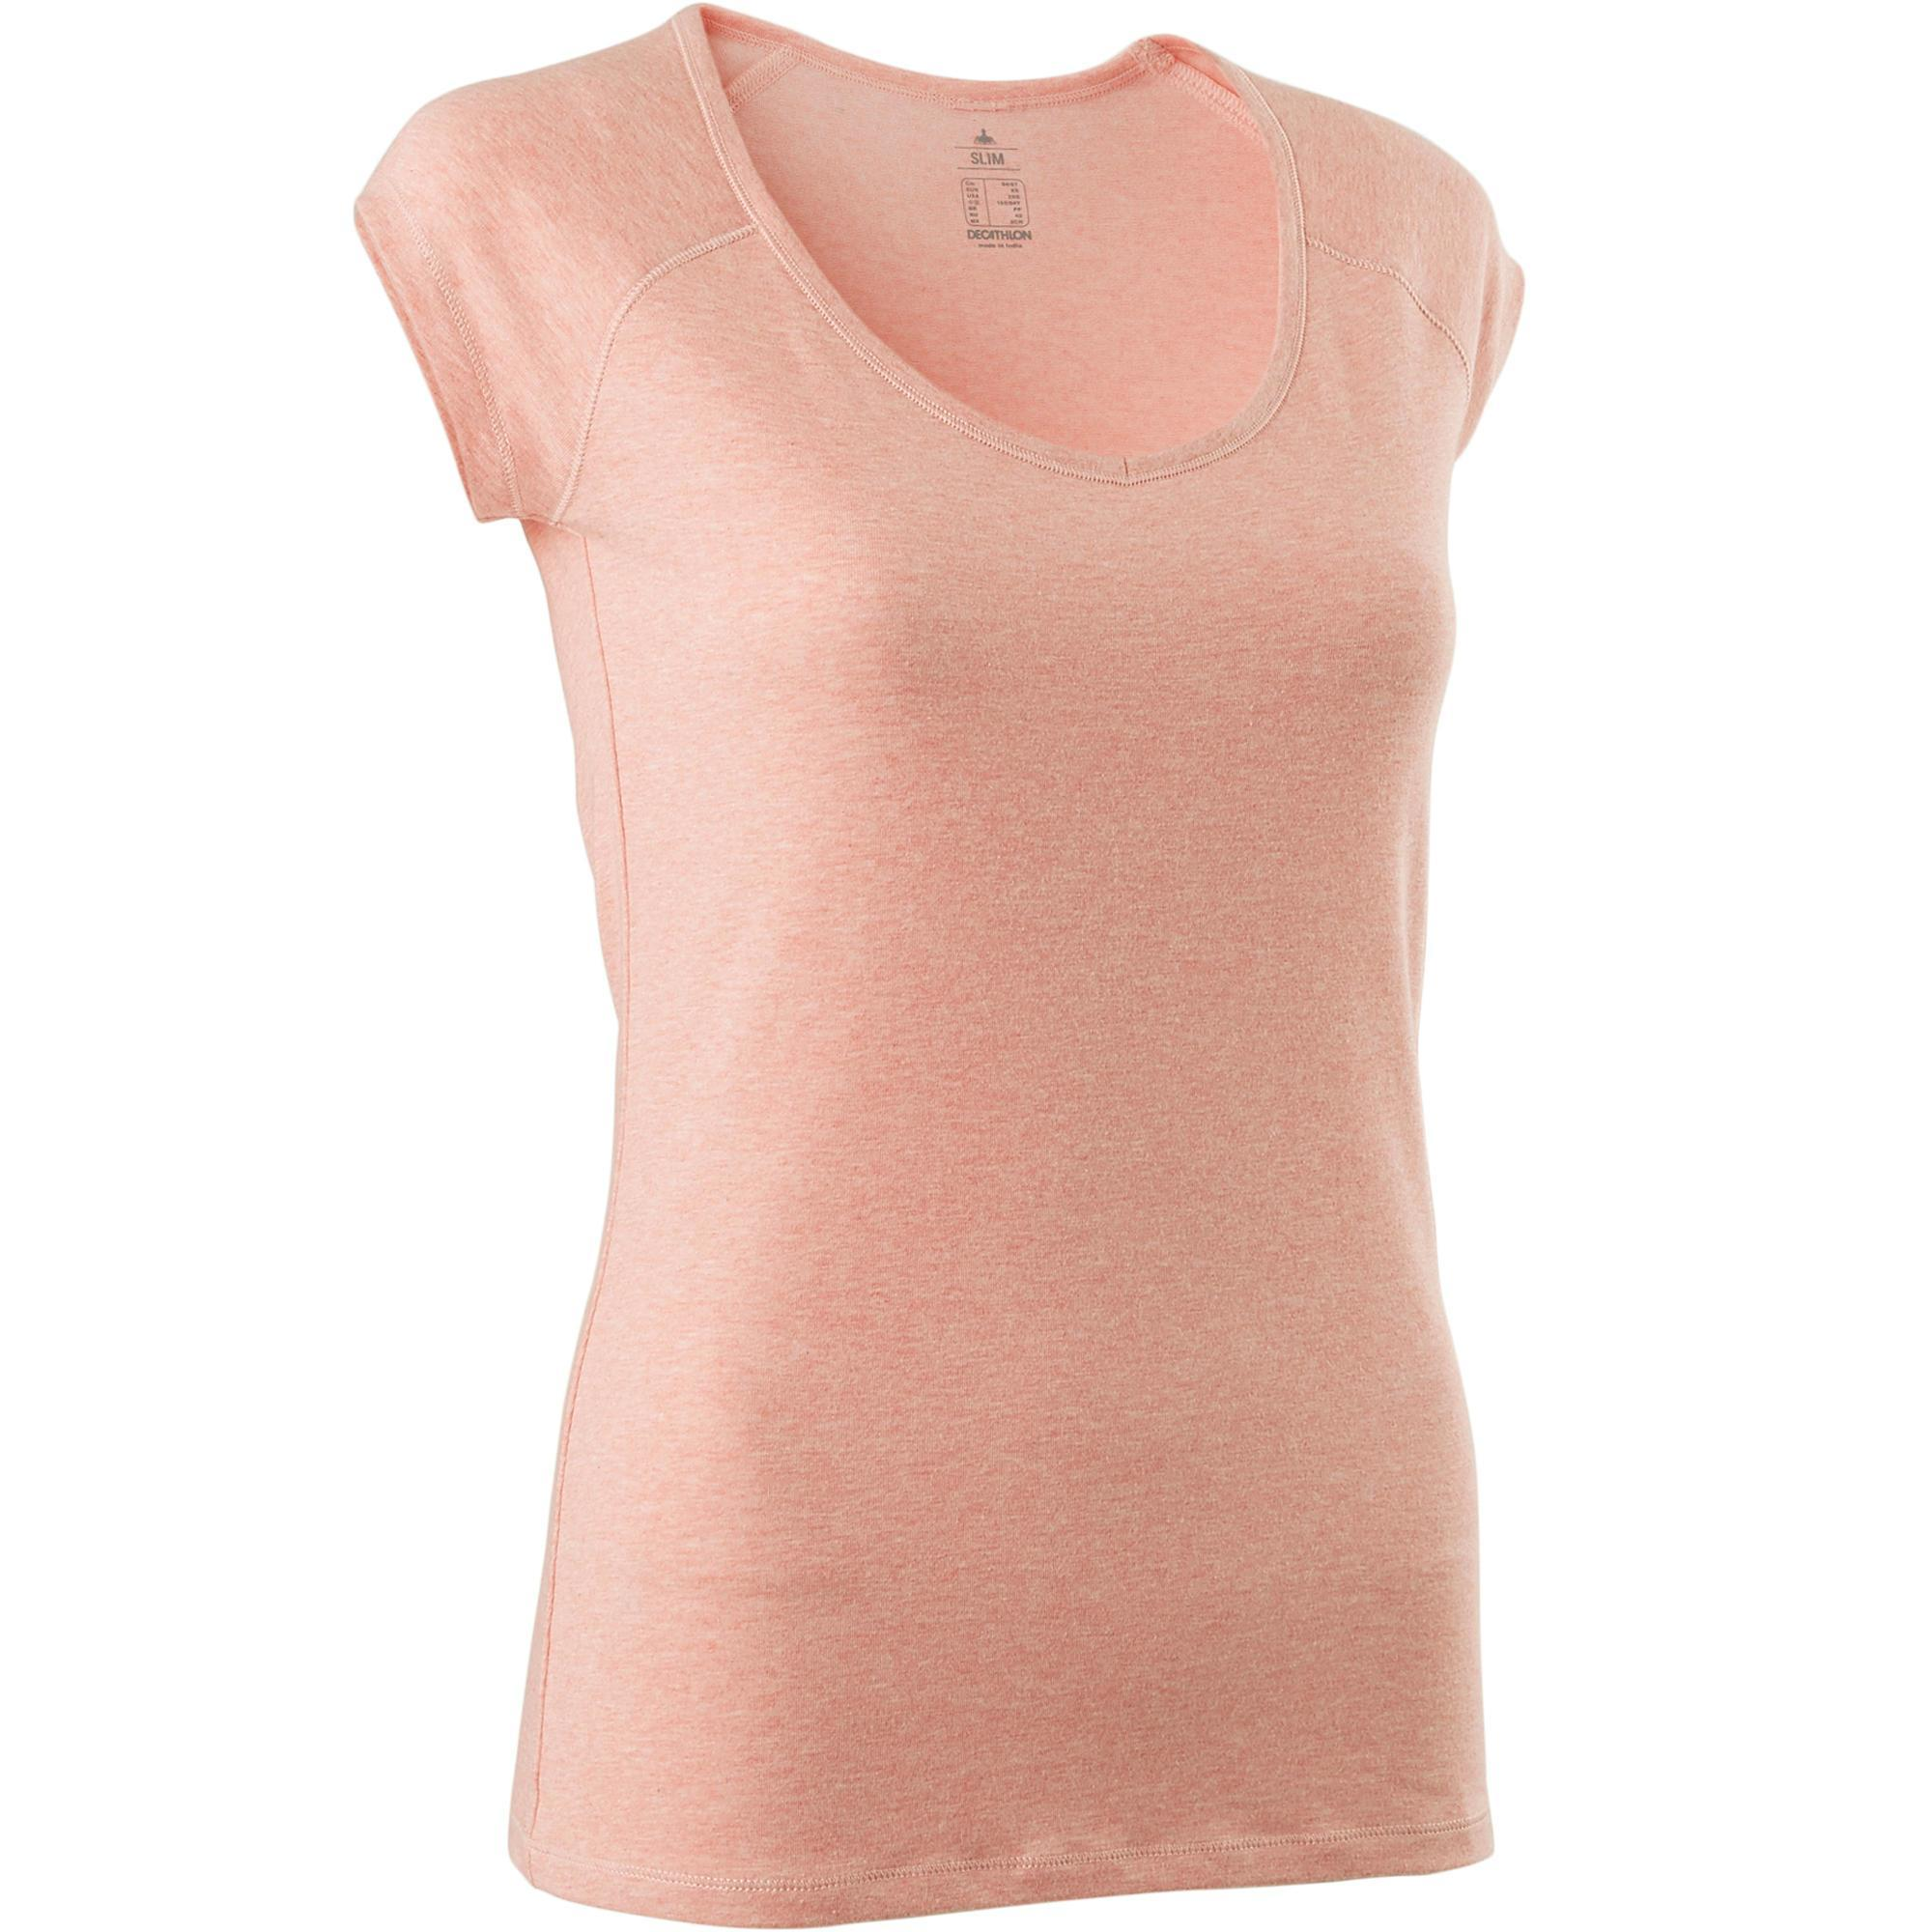 Domyos T-shirt 500 slim fit pilates en lichte gym dames gemêleerd lichtroze